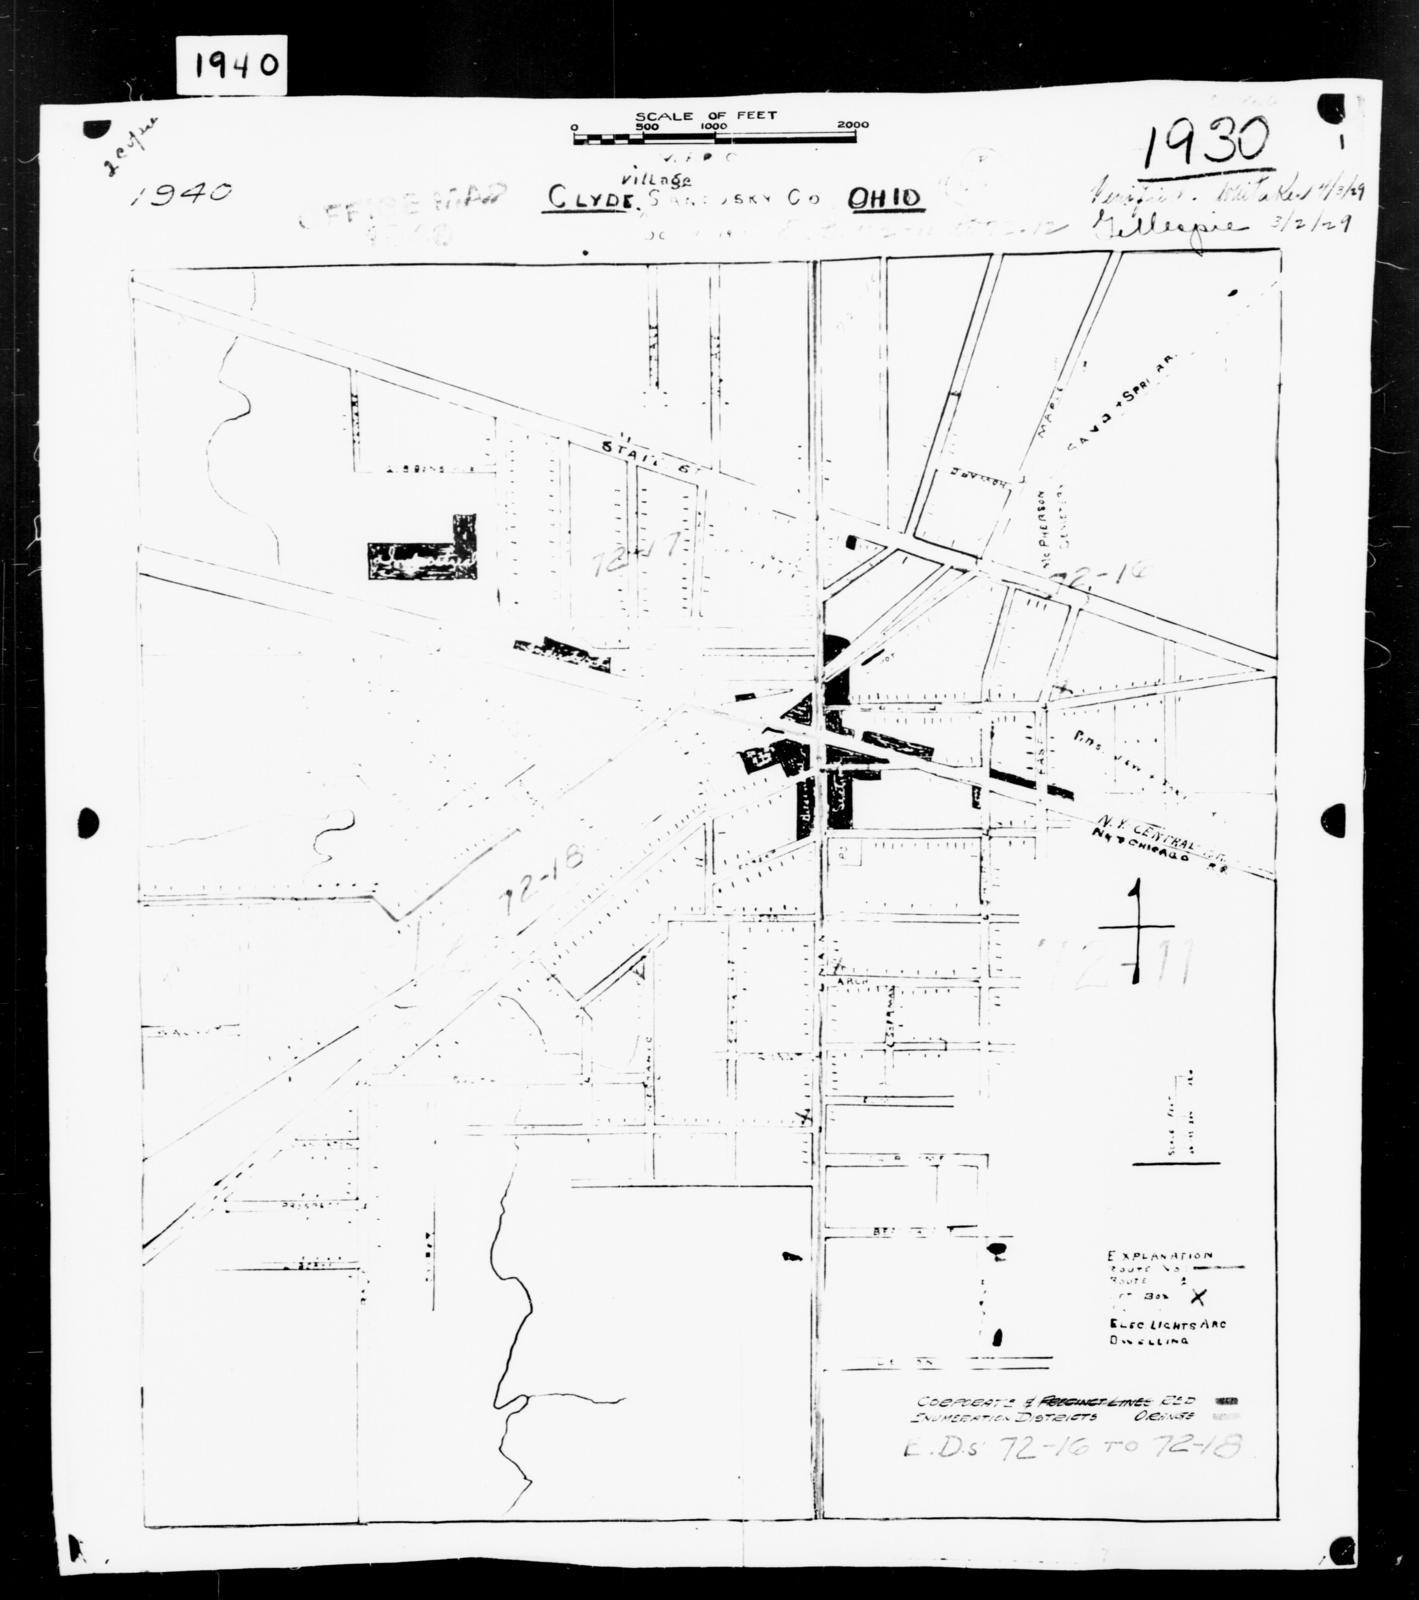 1940 Census Enumeration District Maps - Ohio - Sandusky County - Clyde - ED 72-16, ED 72-17, ED 72-18